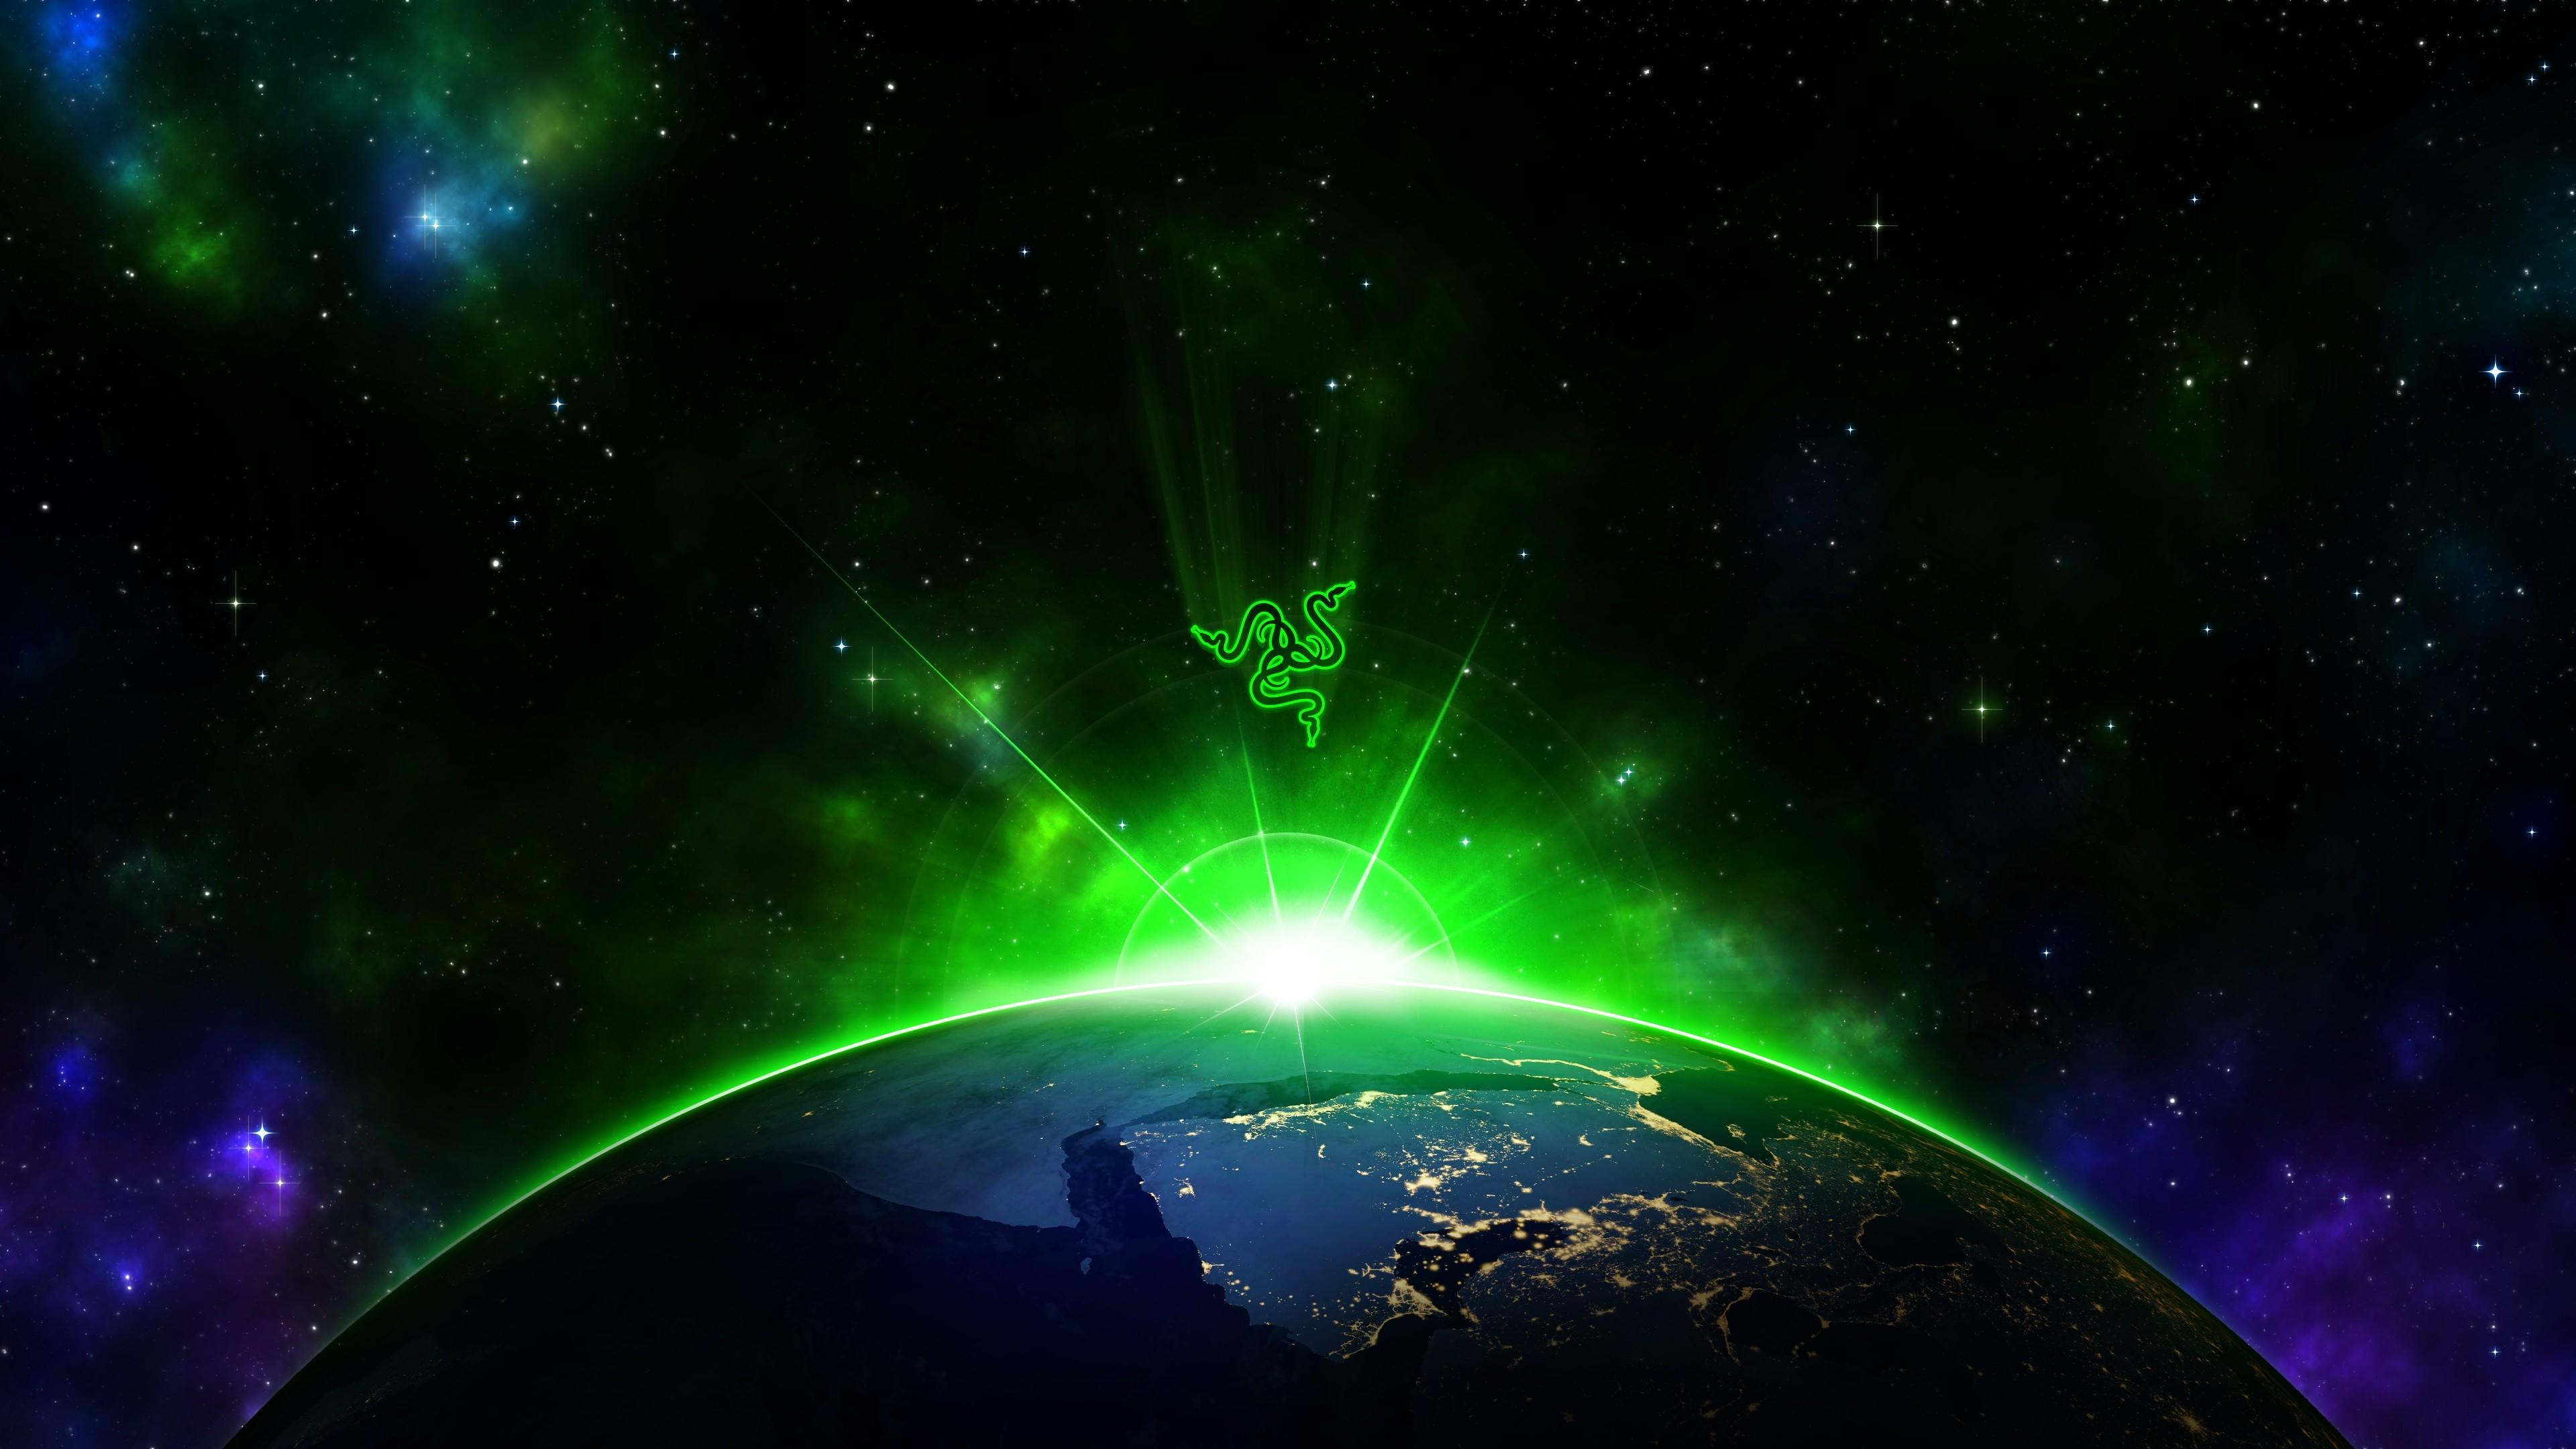 Razer Space 4K Wallpaper